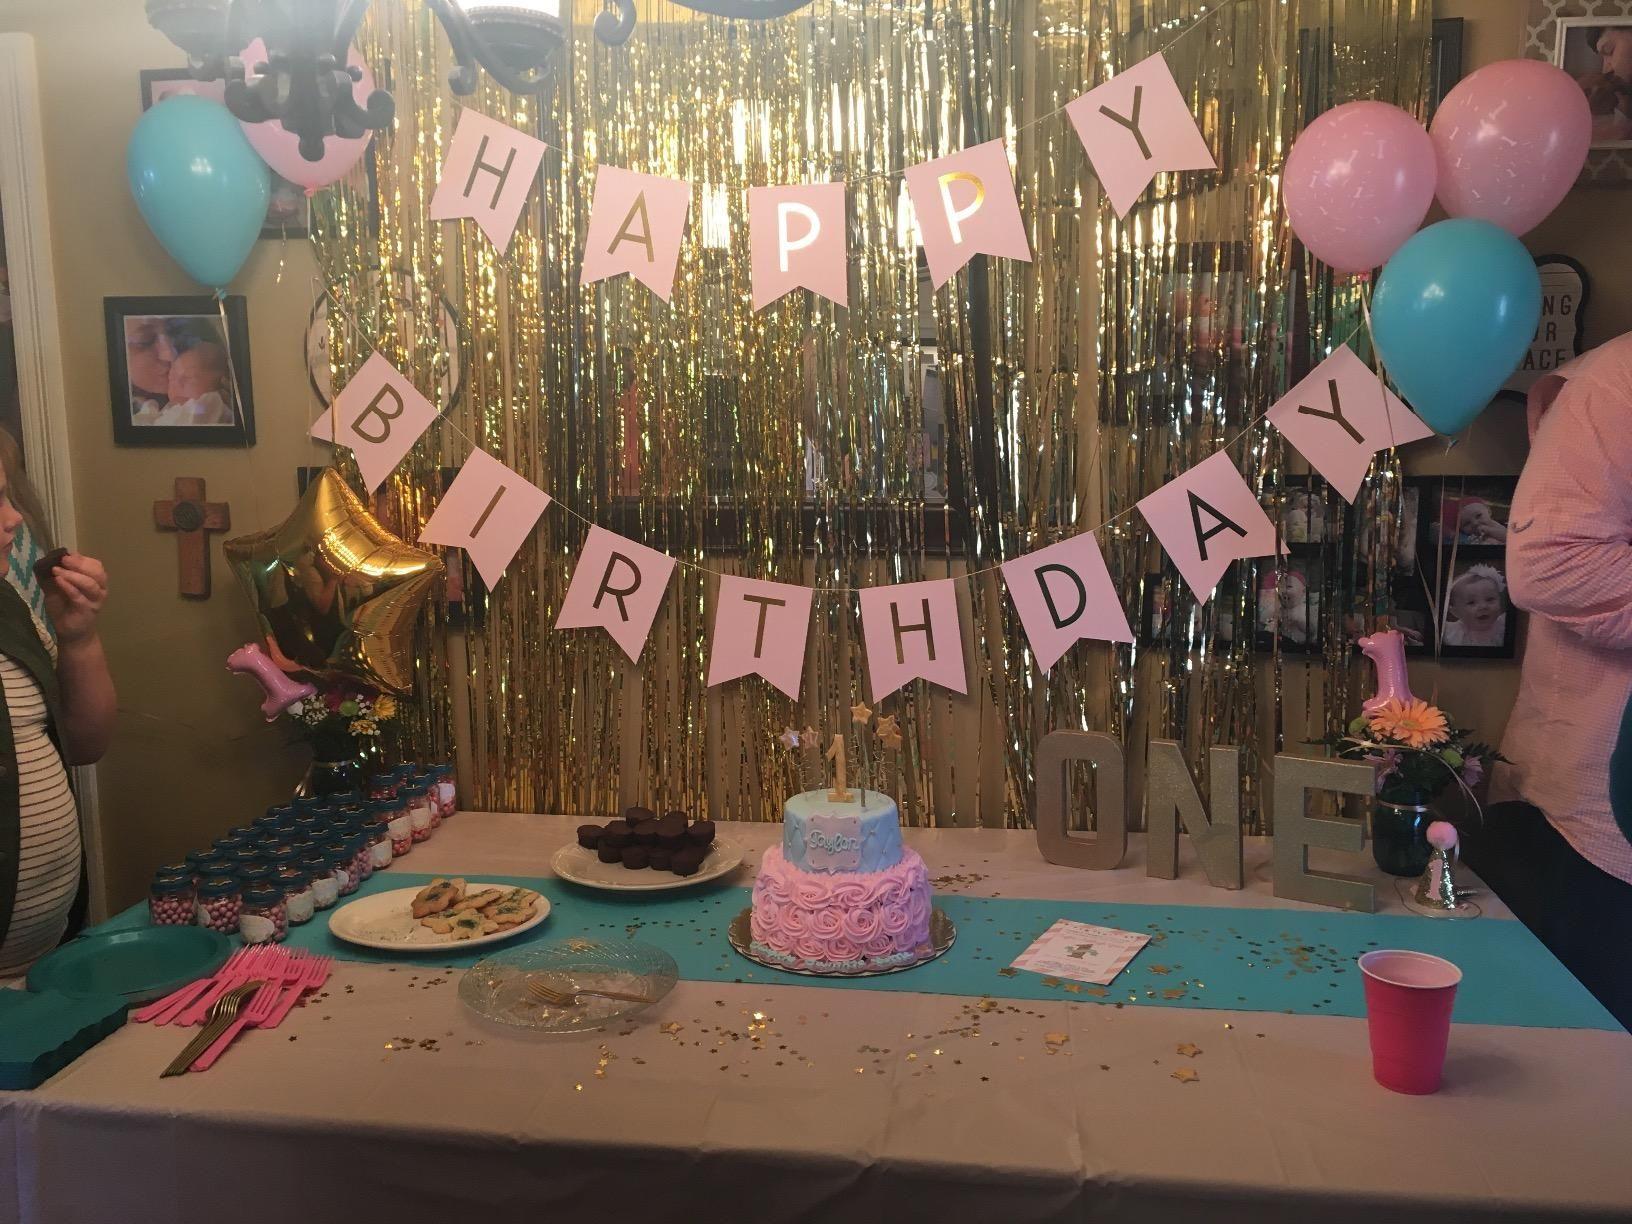 Robot Check Baby Birthday Decorations Birthday Surprise Party Birthday Decorations